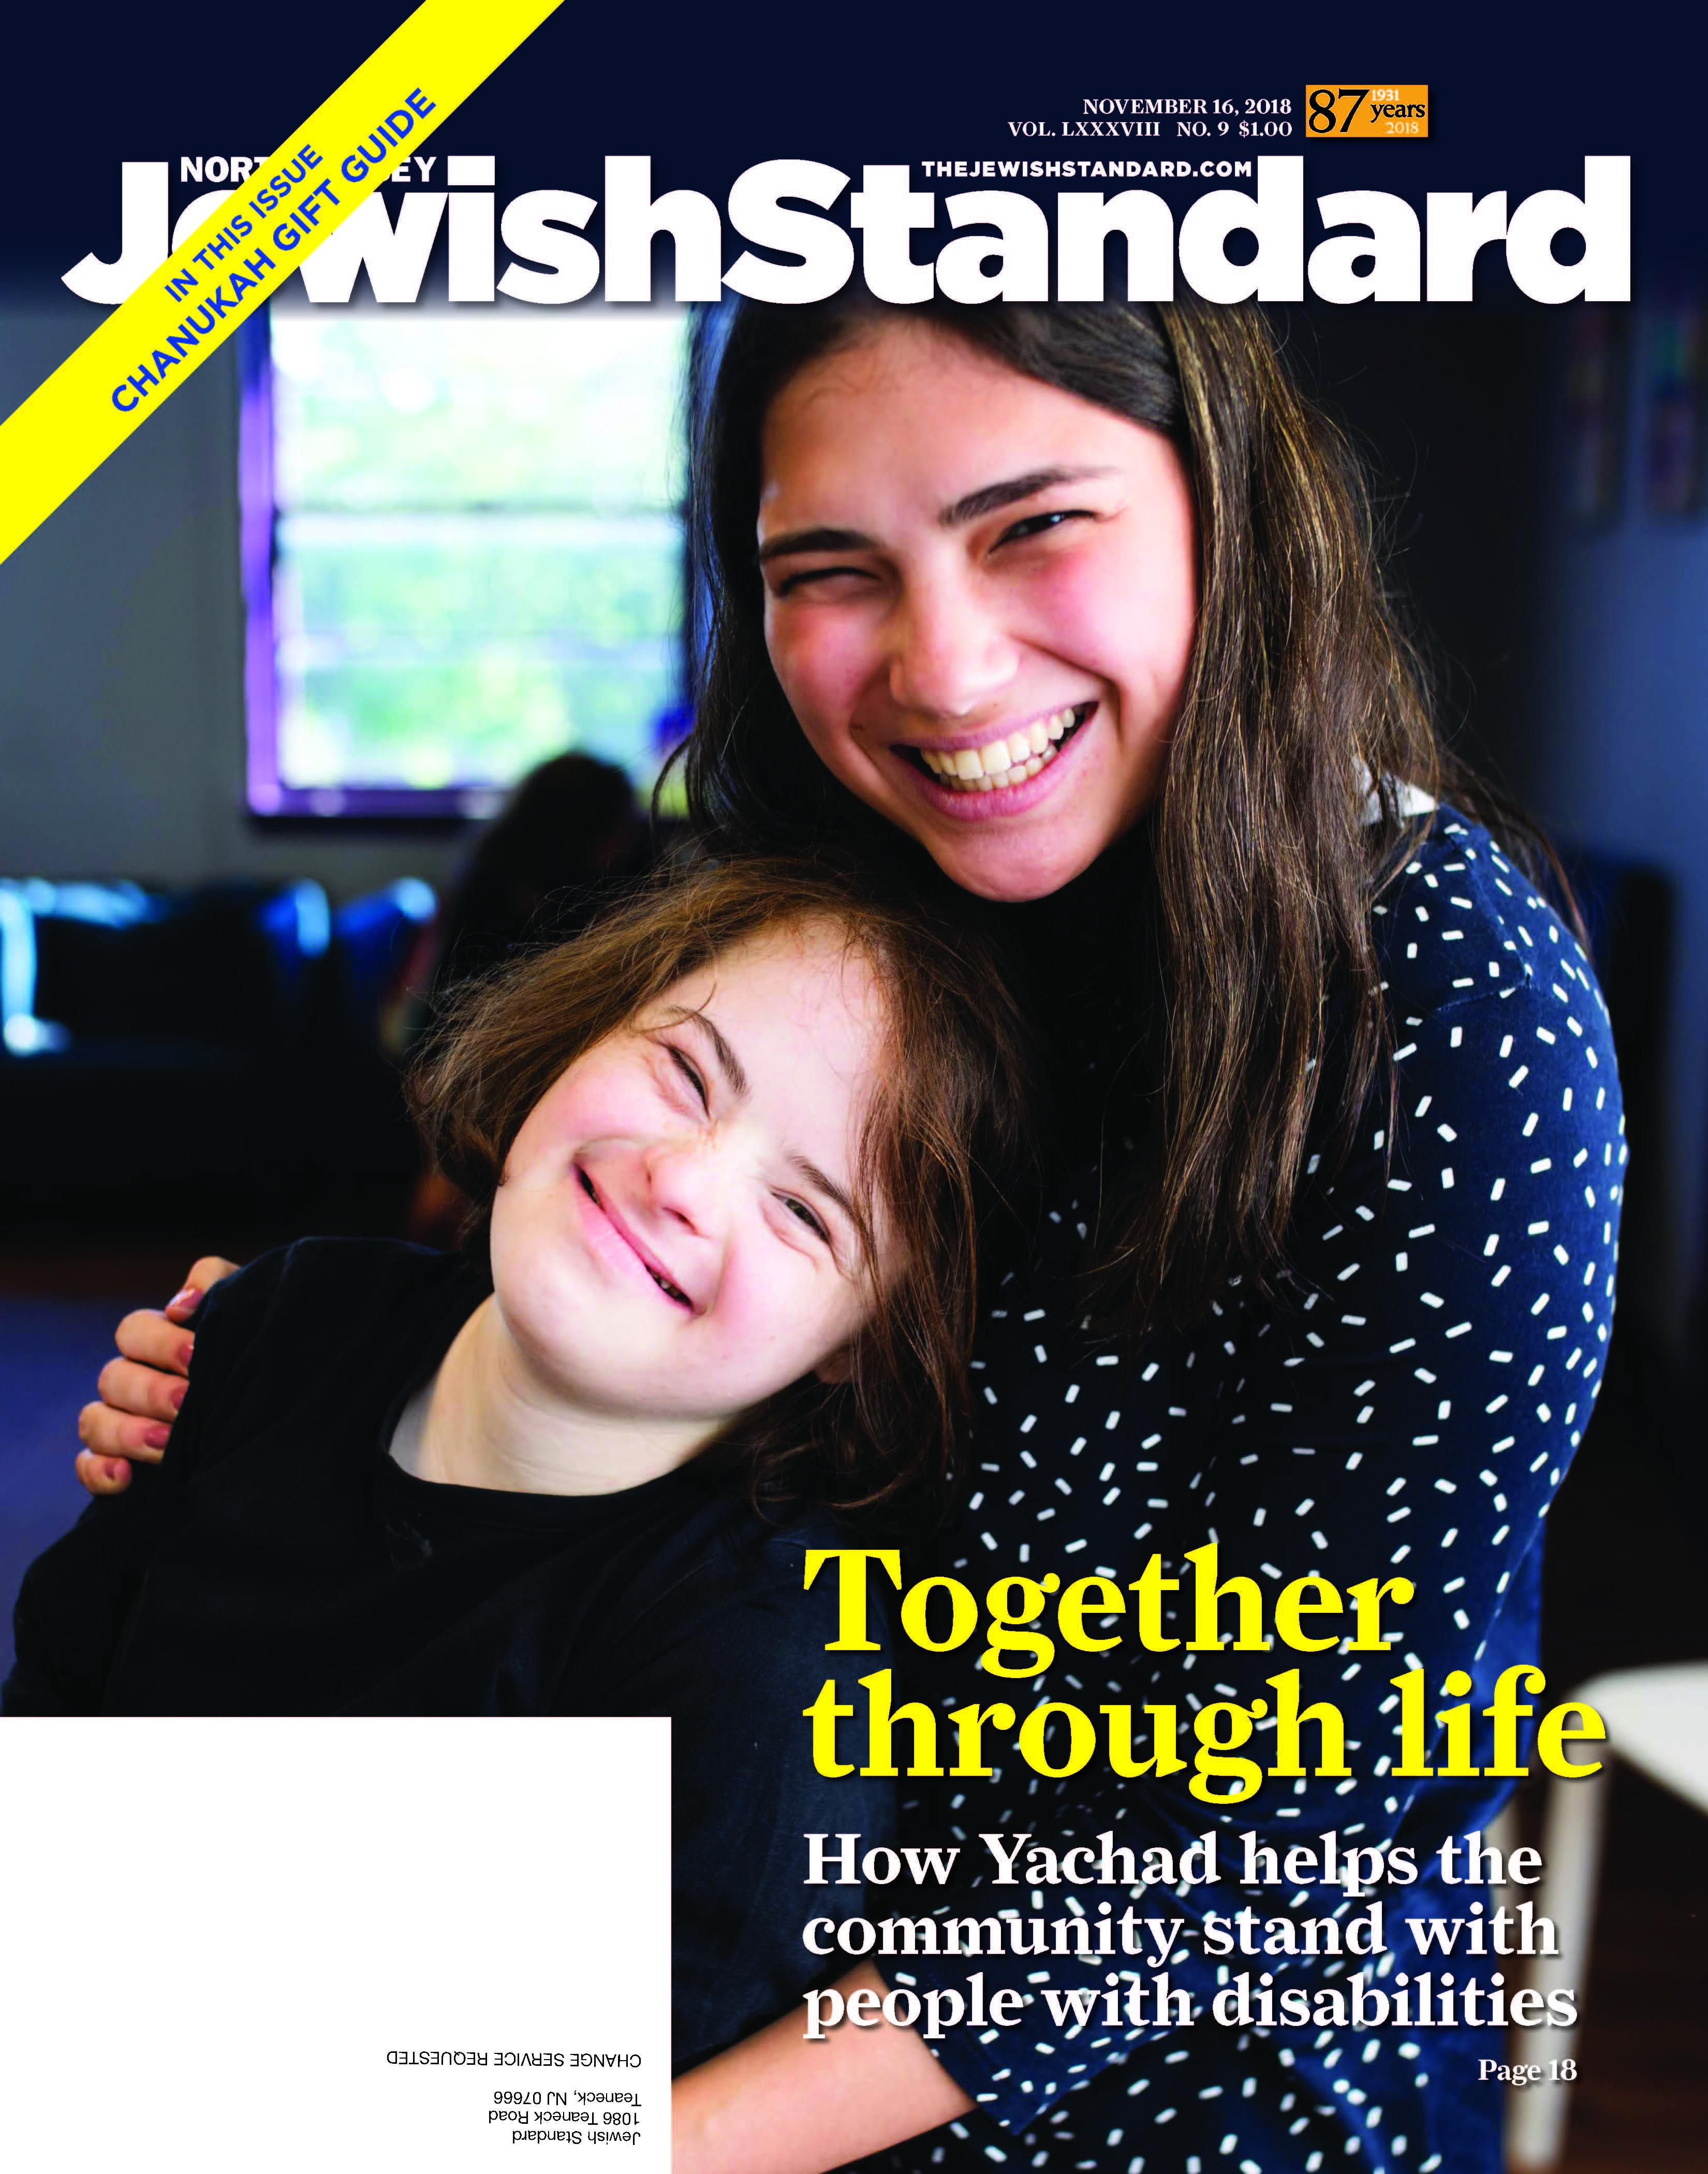 Jewish Standard, November 16, 2018